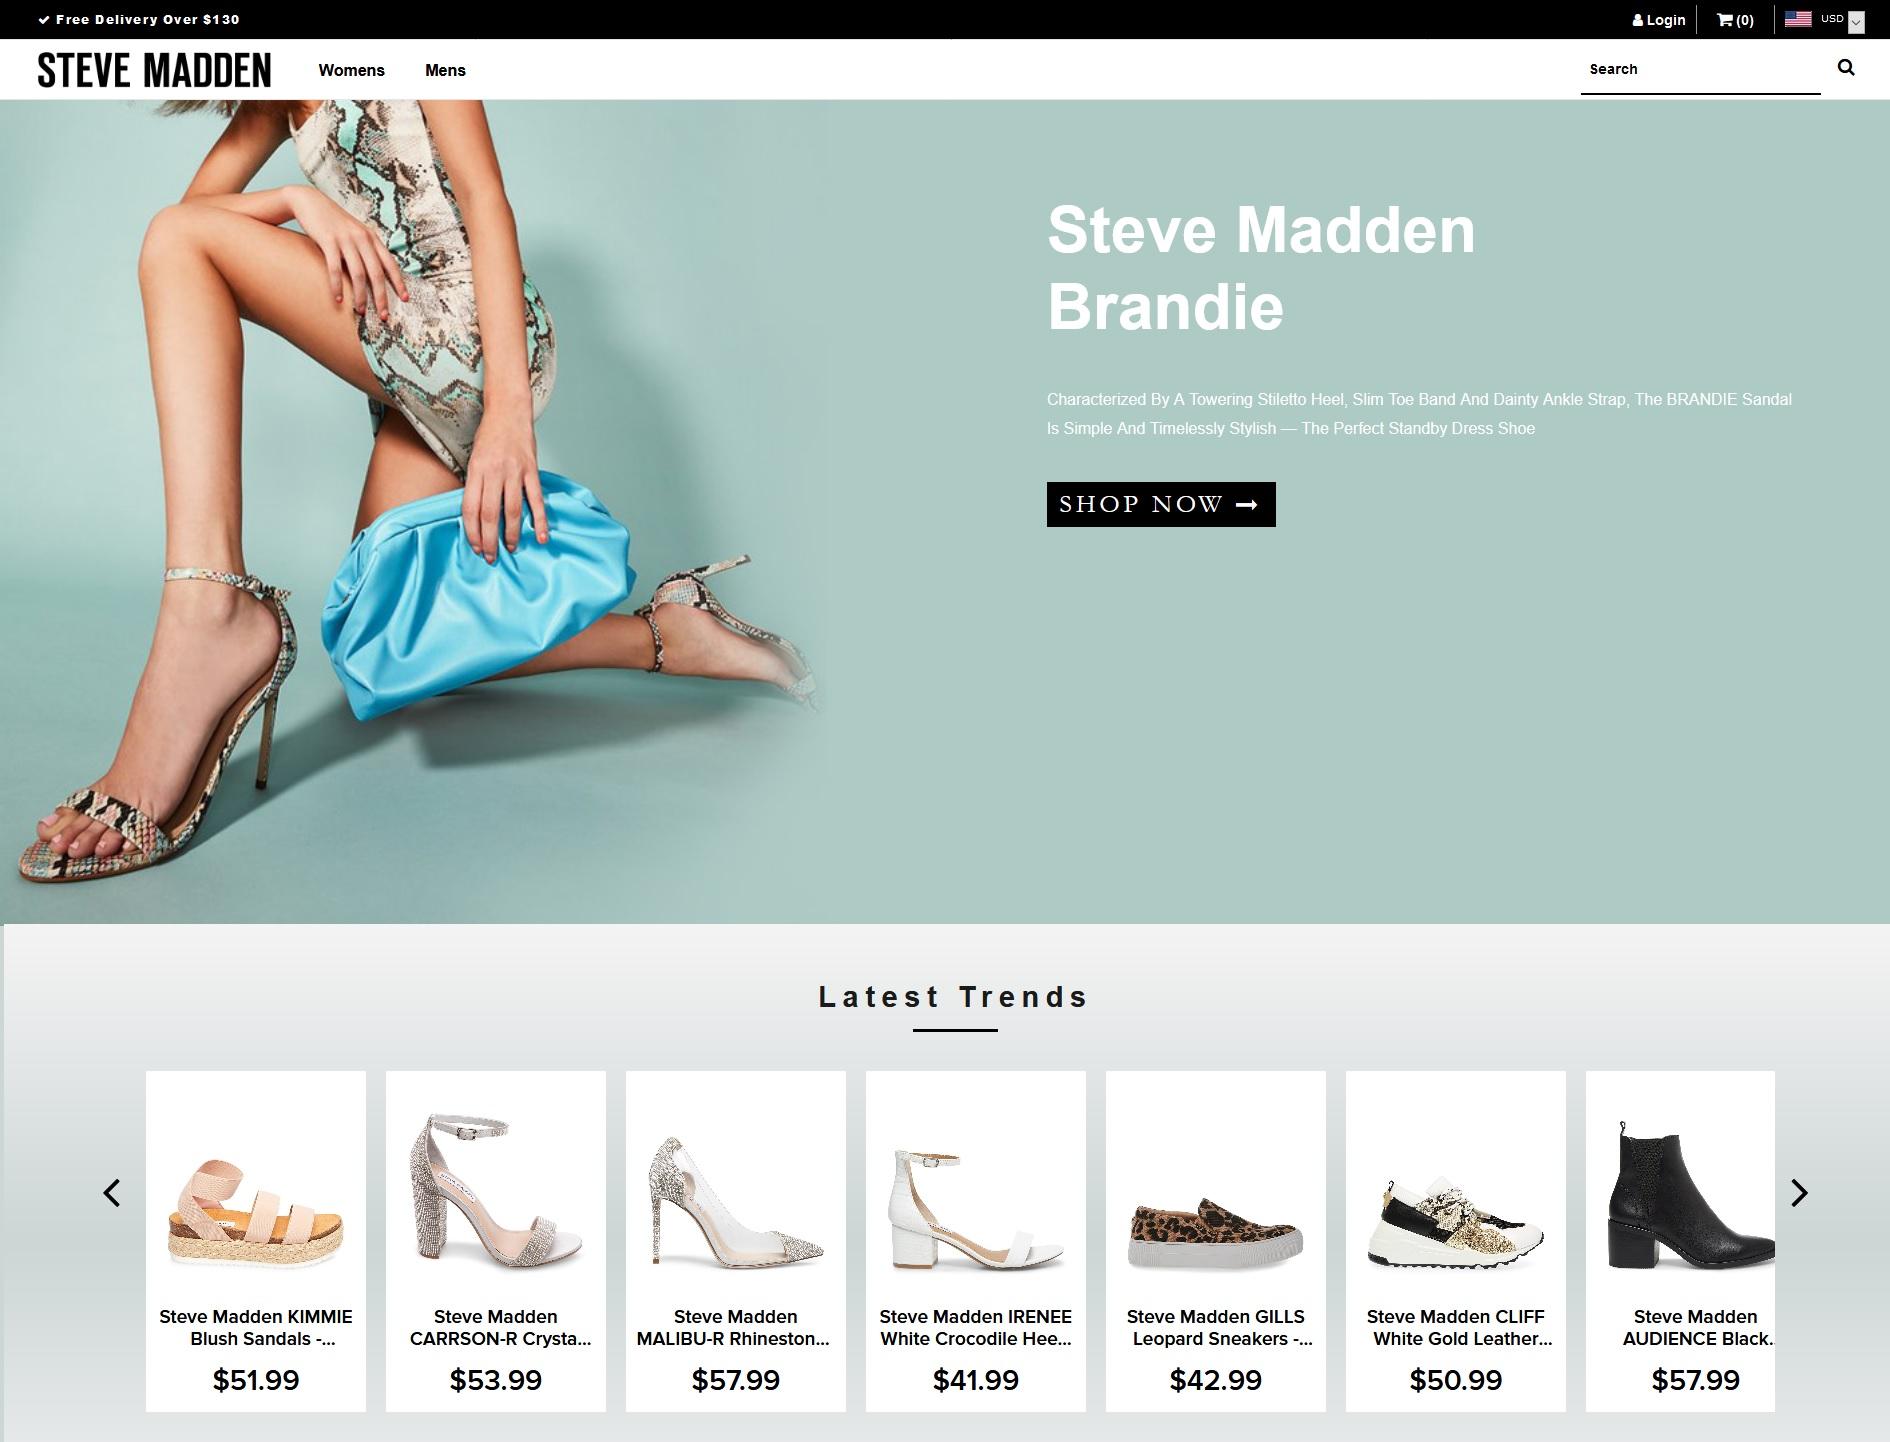 Cybersquatting Chaussures Steve Madden